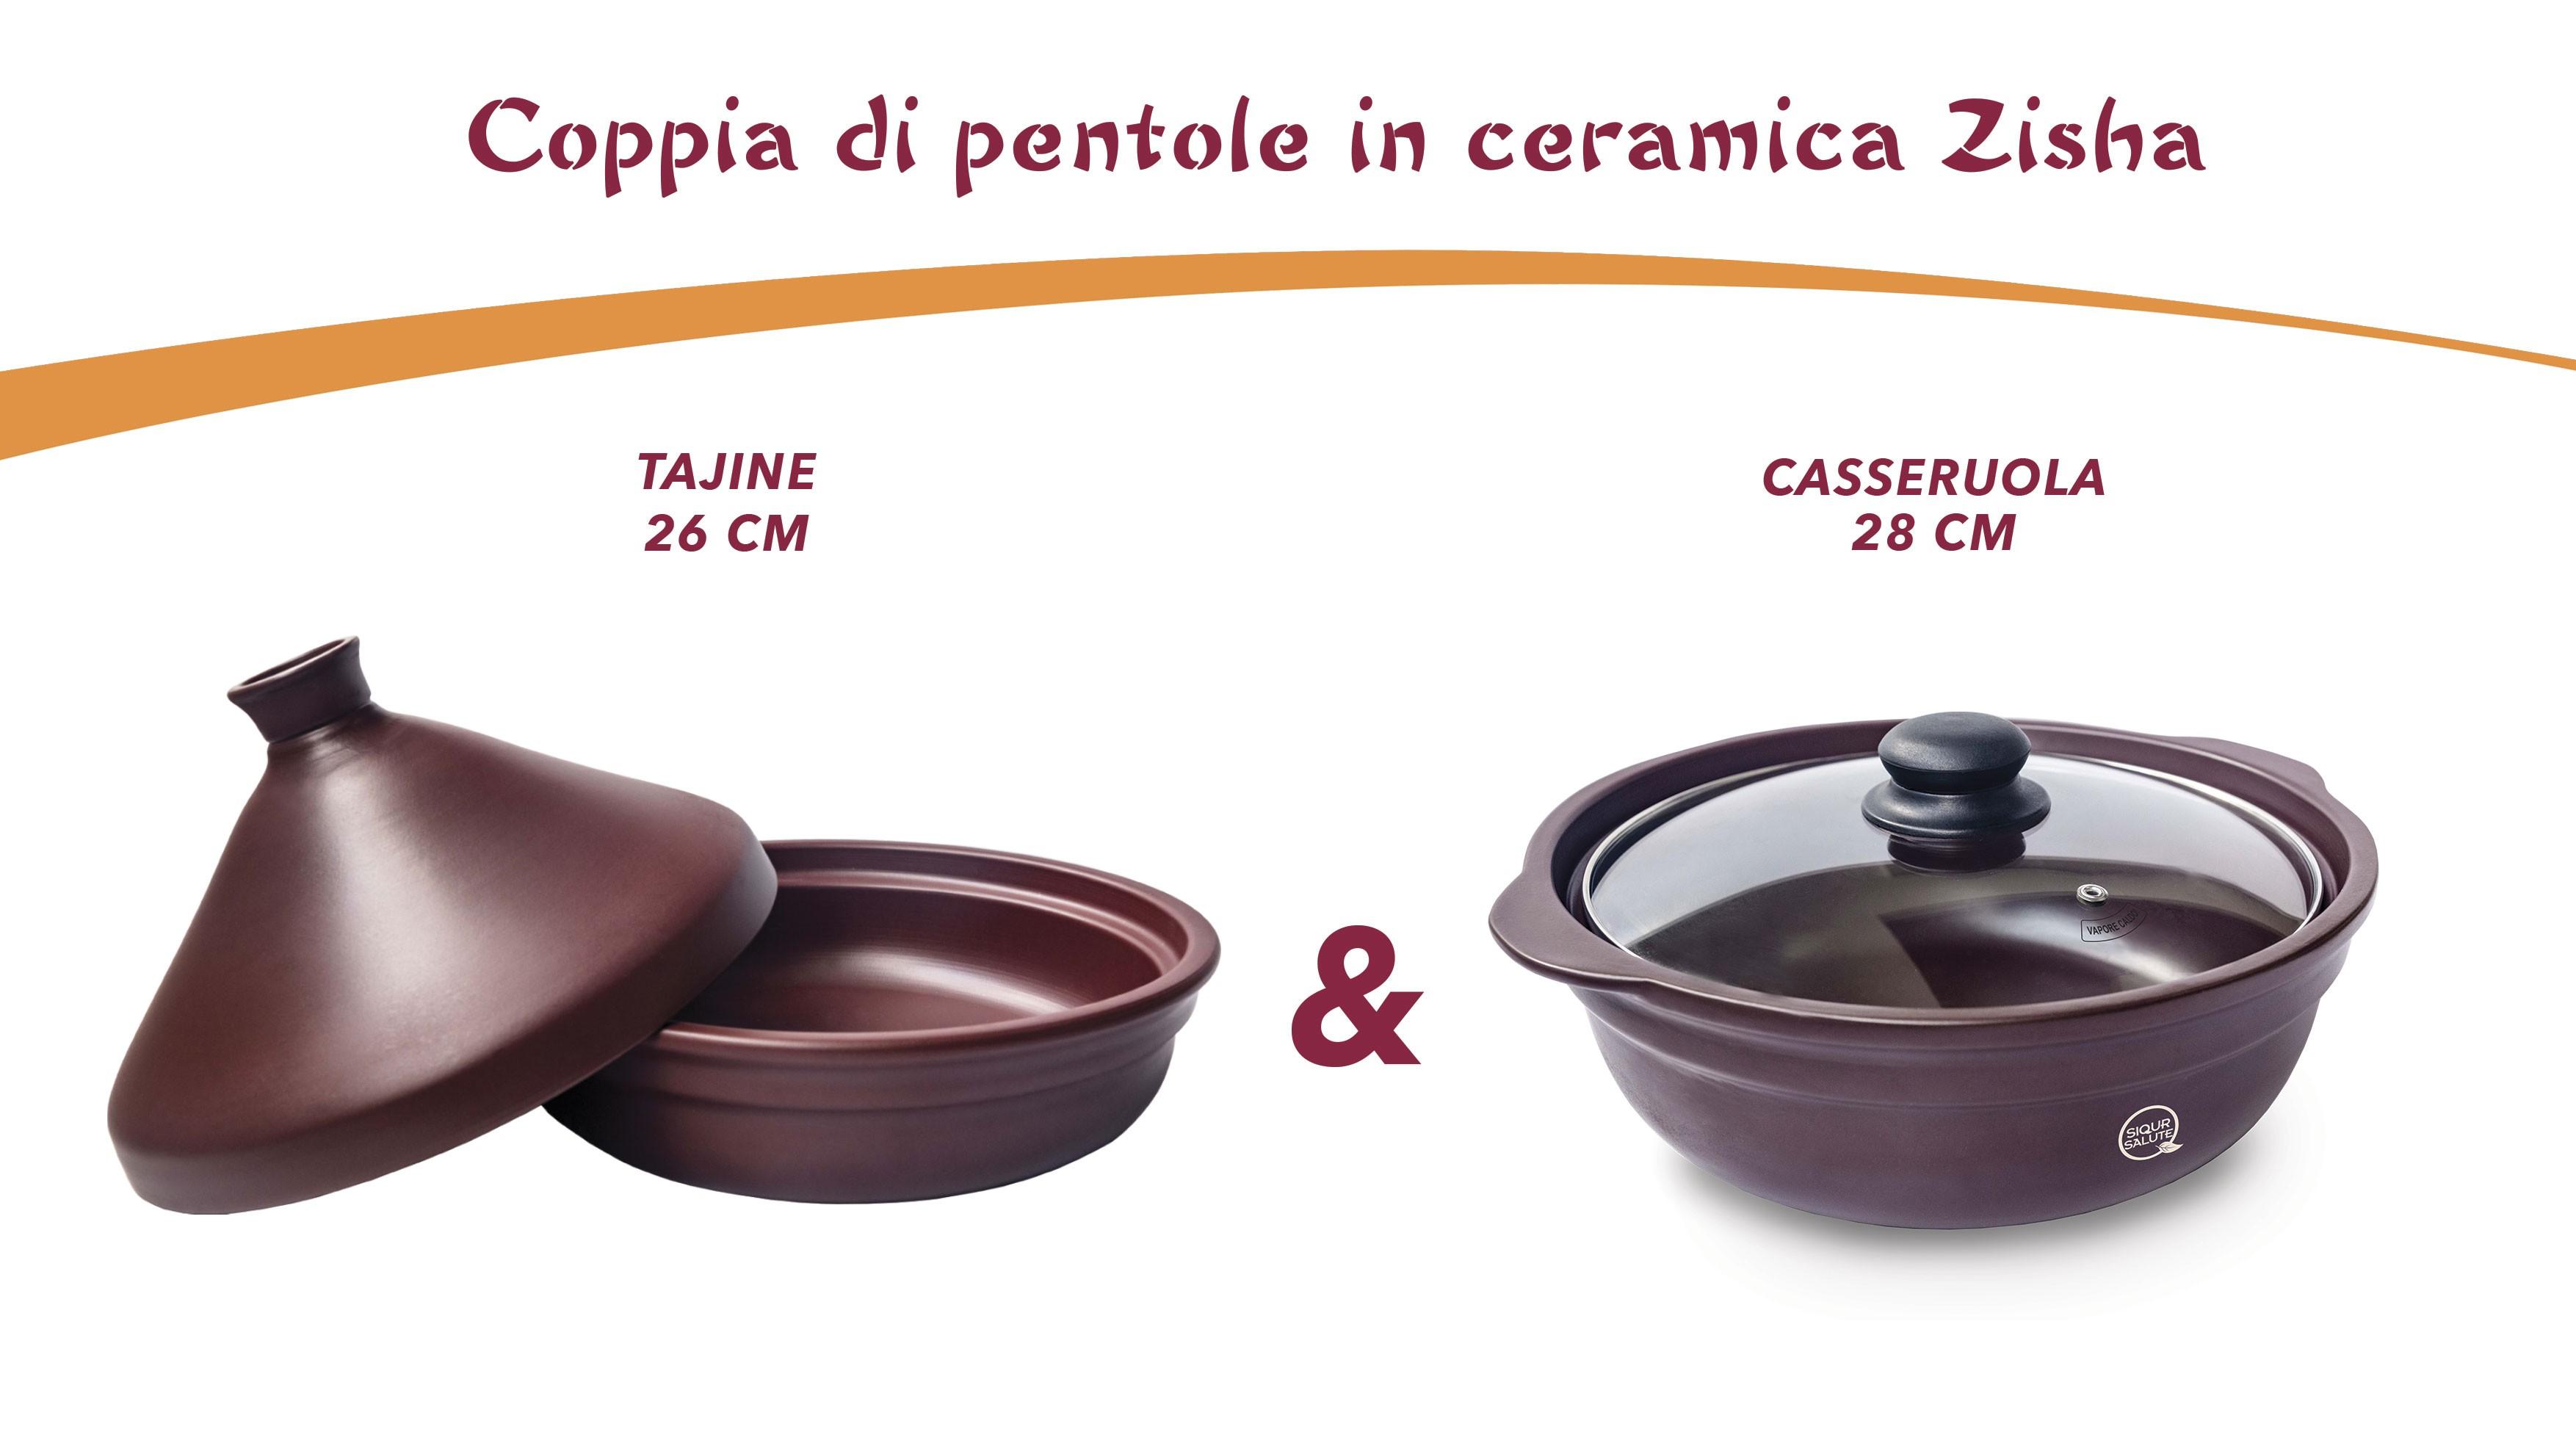 Coppia di pentole in ceramica Zisha (Tajine 26 & Casseruola 28)